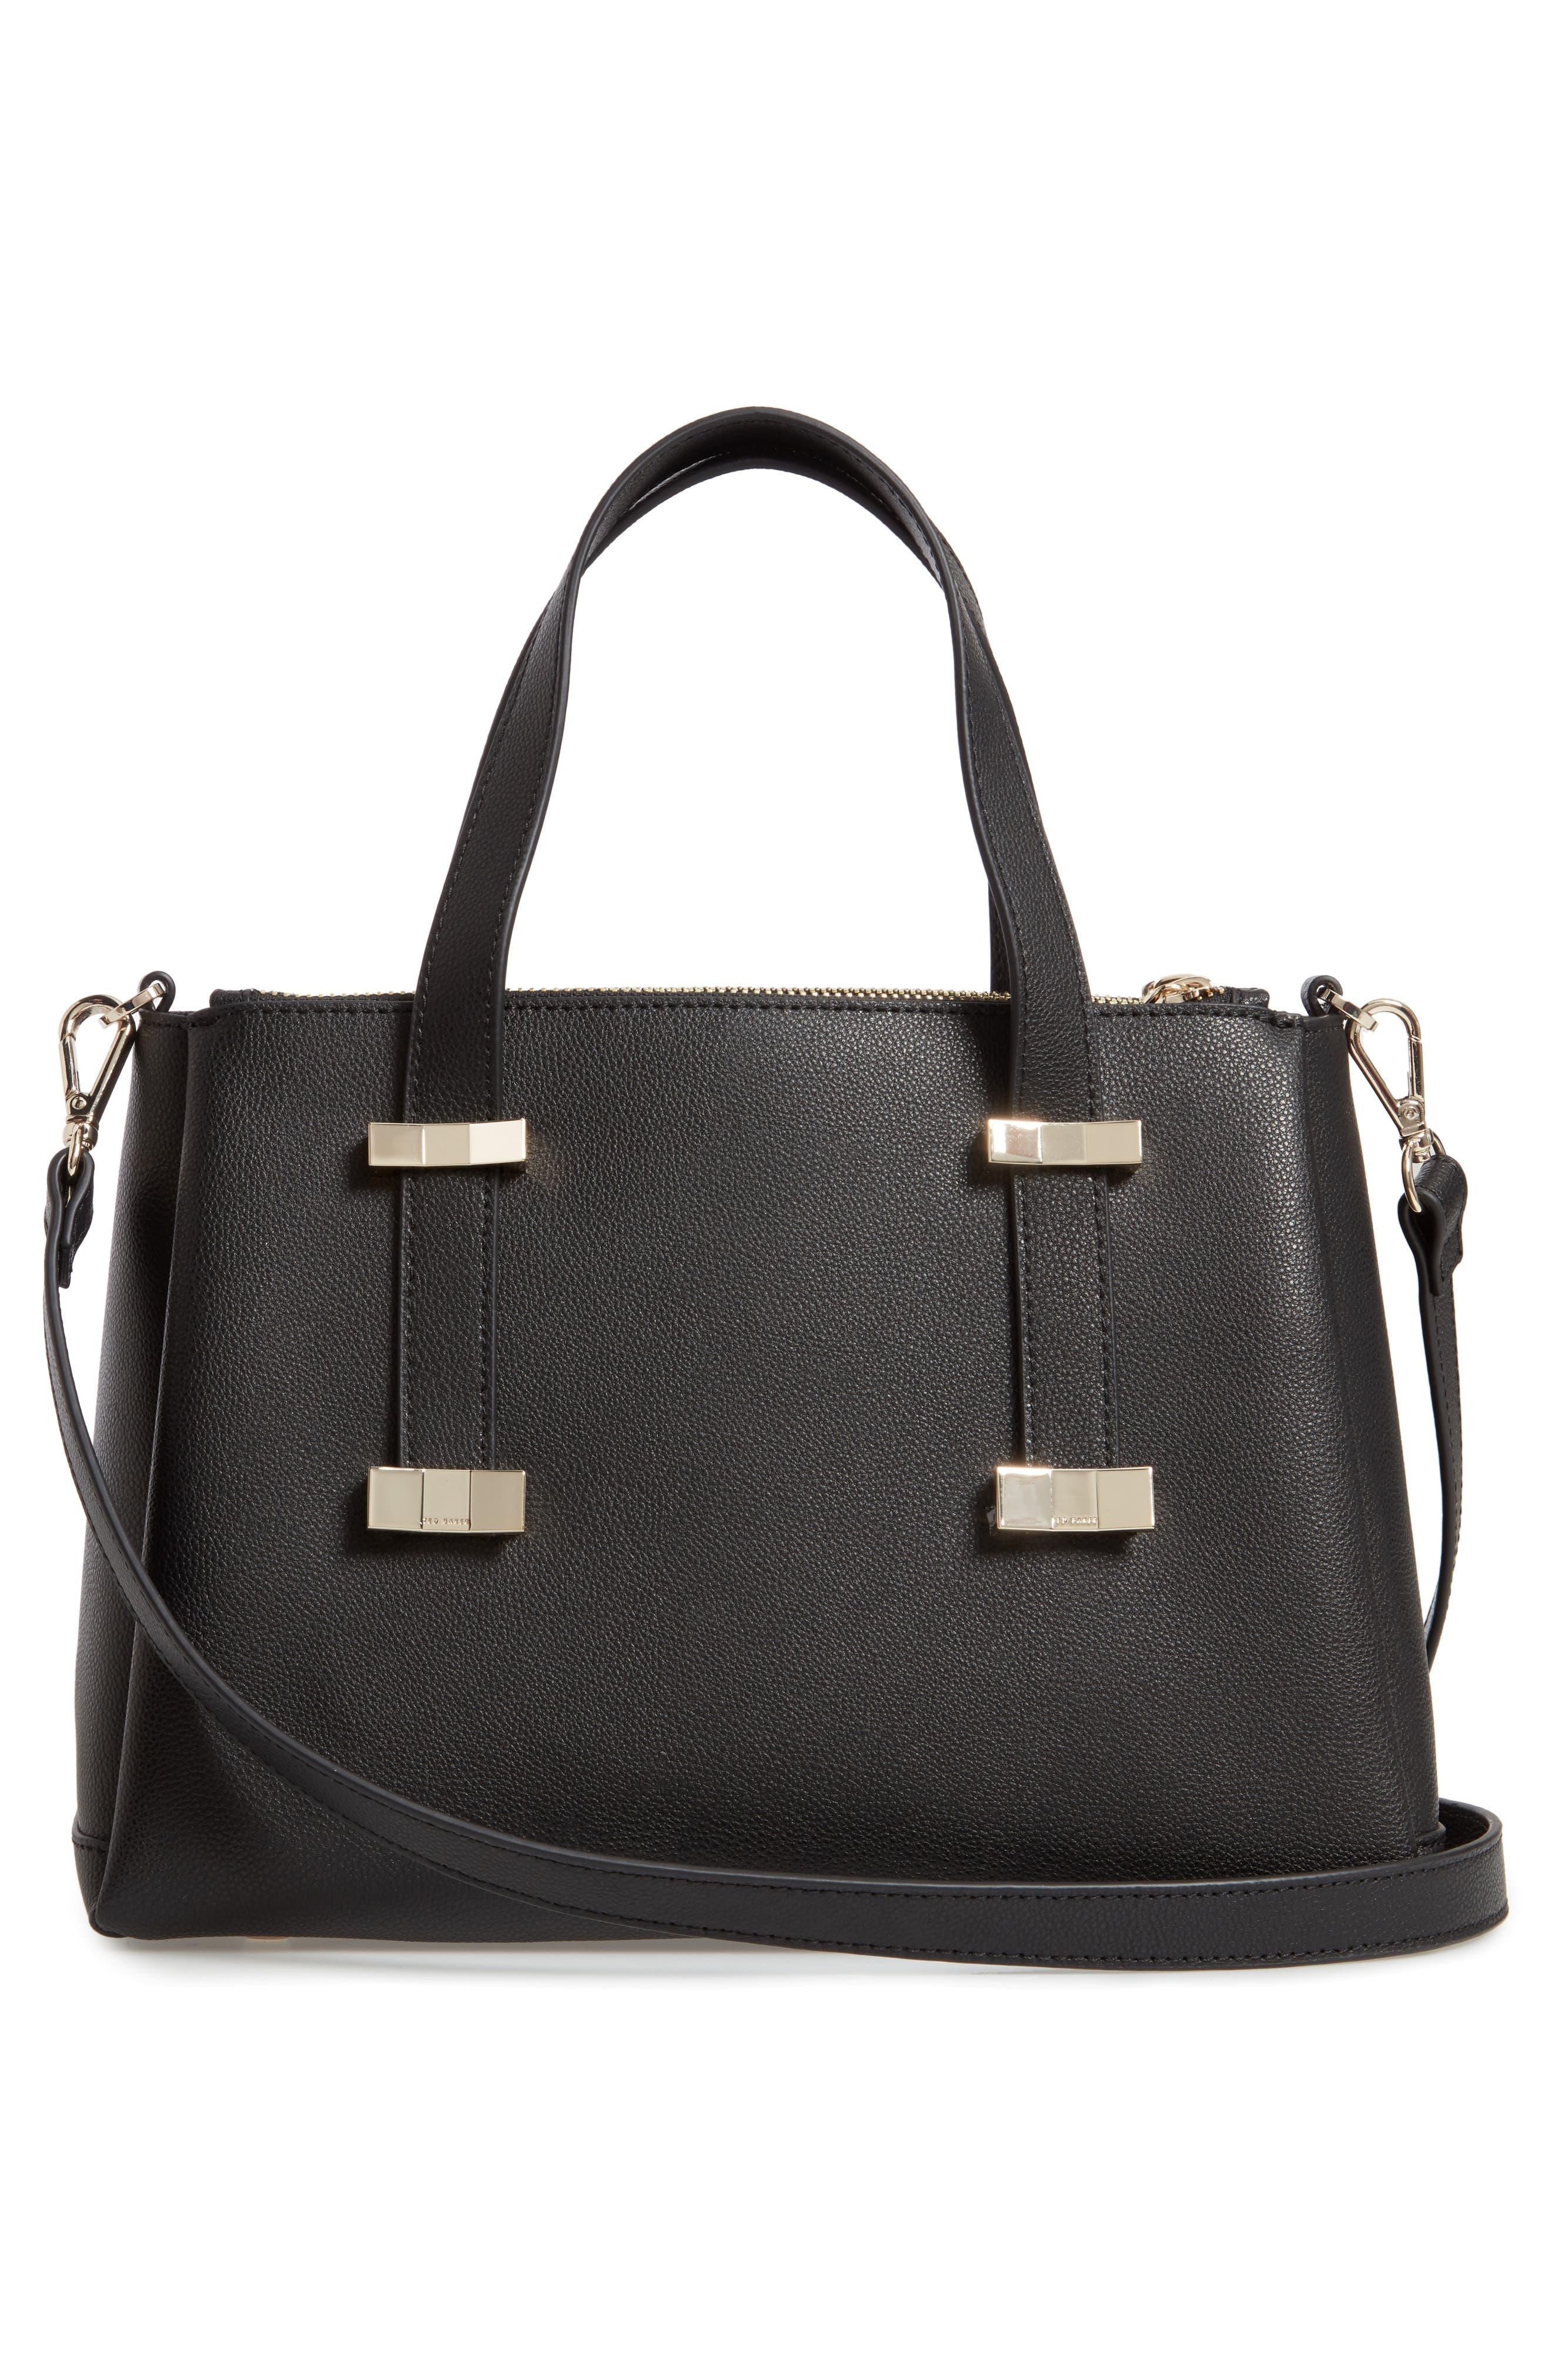 Julieet Large Adjustable Handle Leather Satchel,                             Alternate thumbnail 3, color,                             BLACK